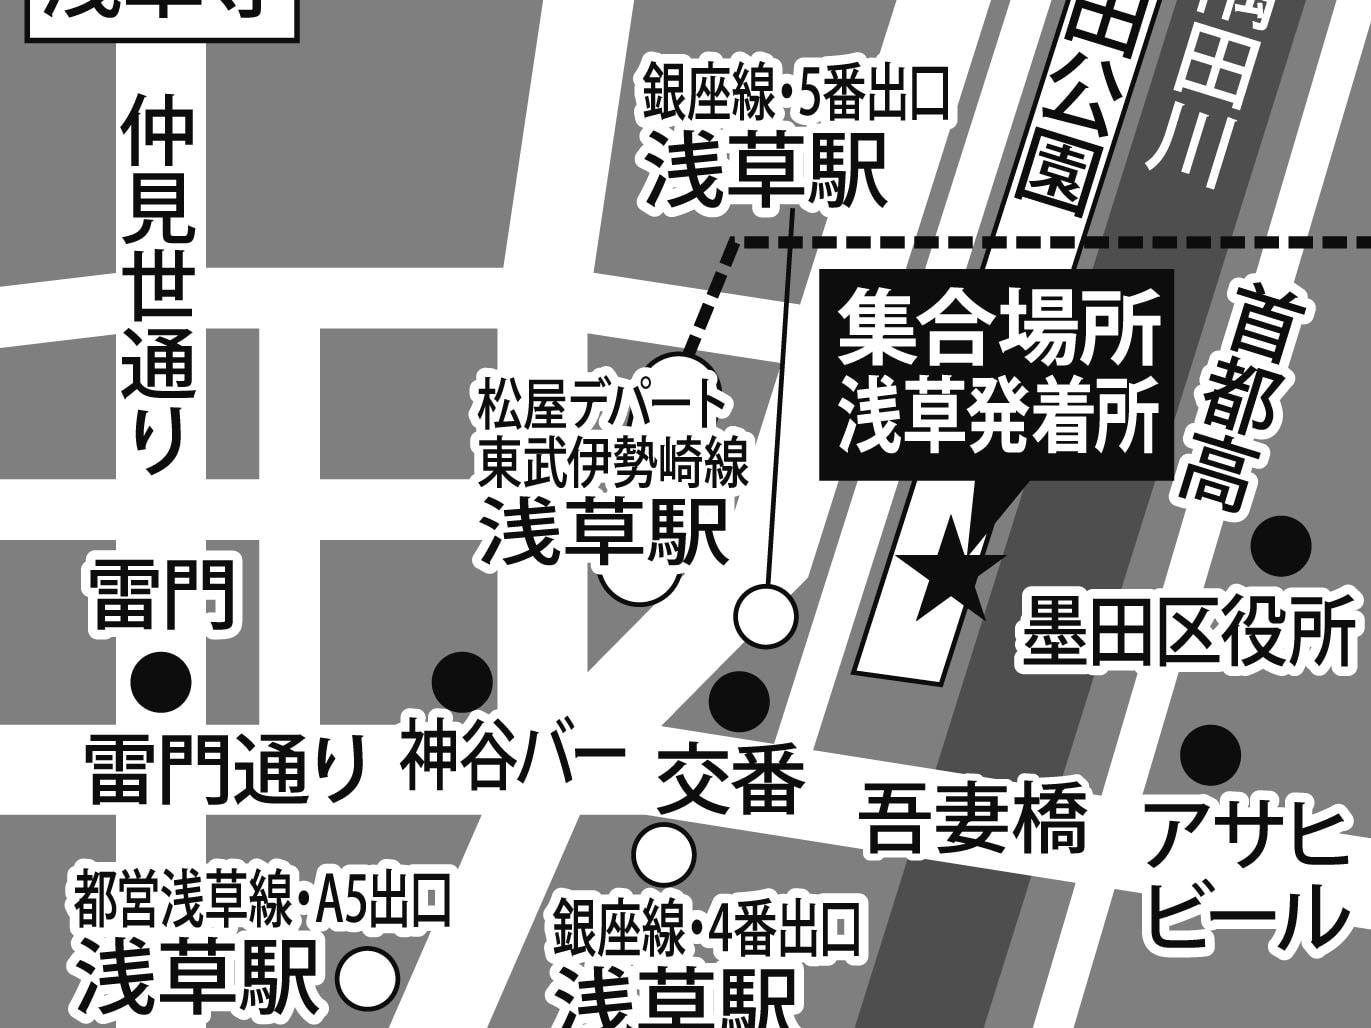 eventid_4029_map1